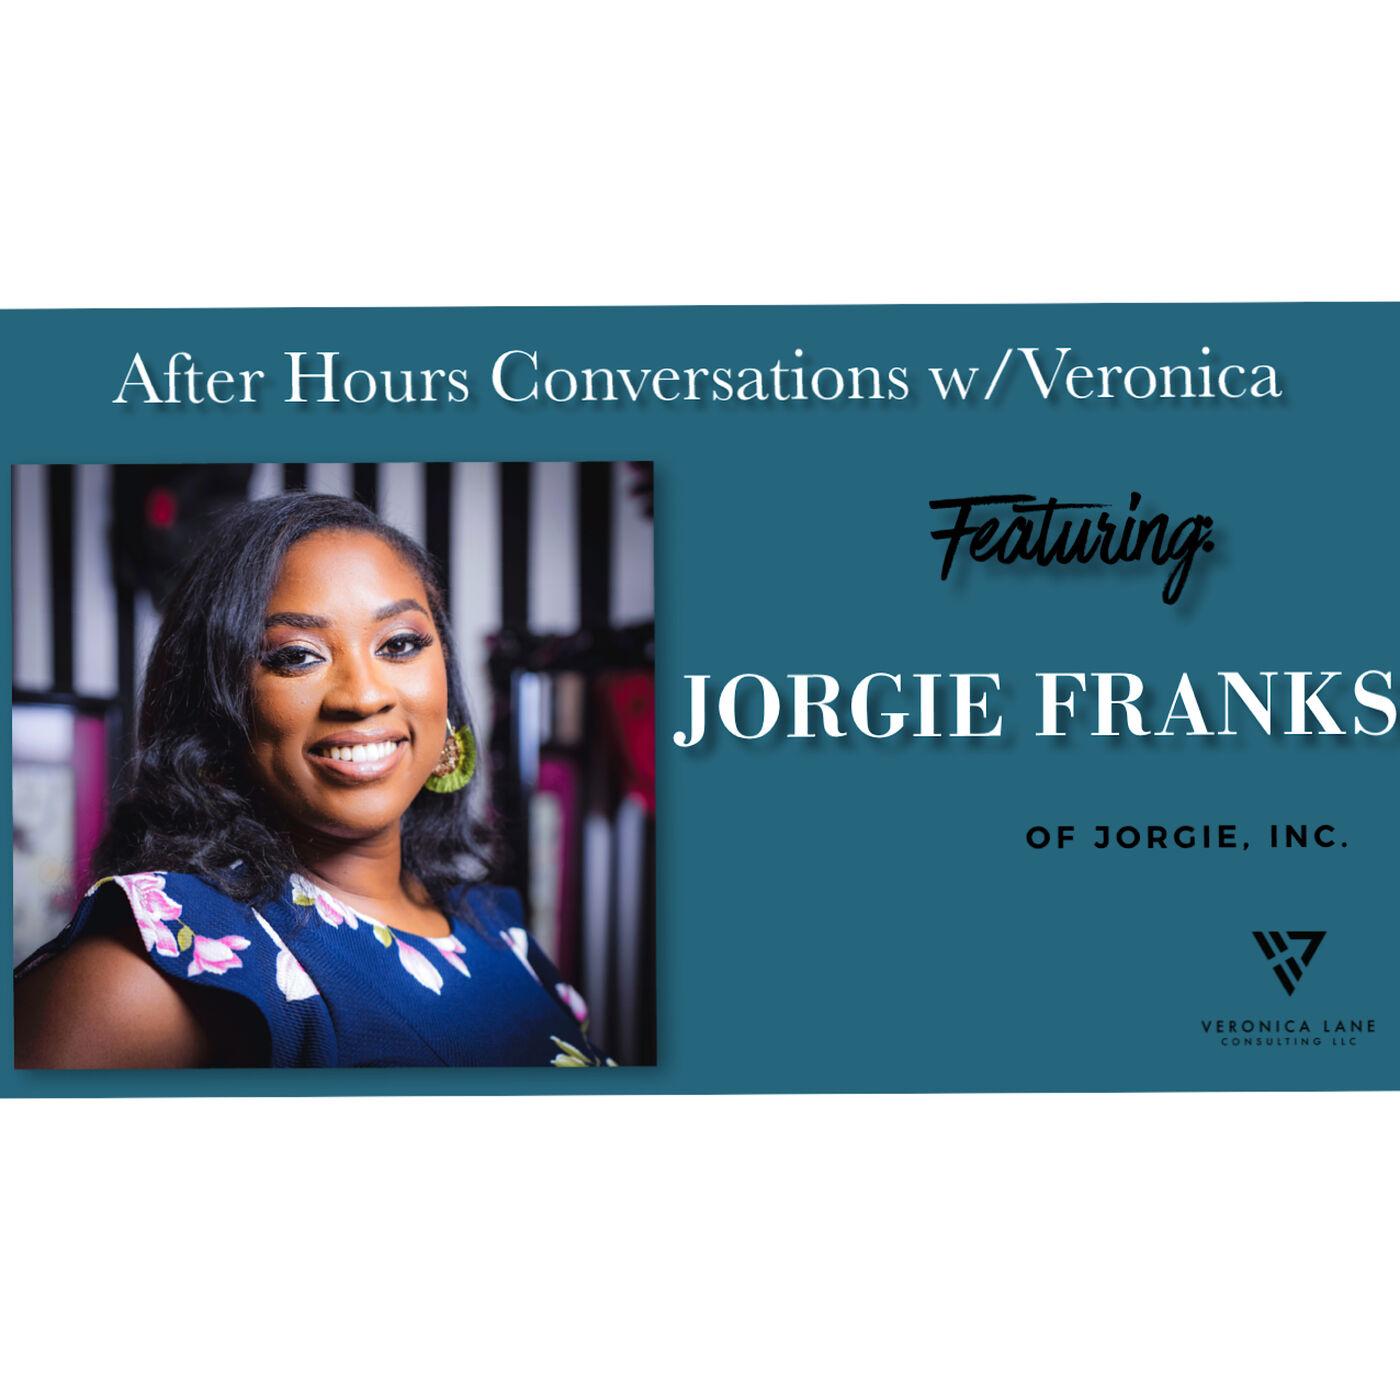 After Hours Conversations w/Veronica: Featuring Jorgie Franks